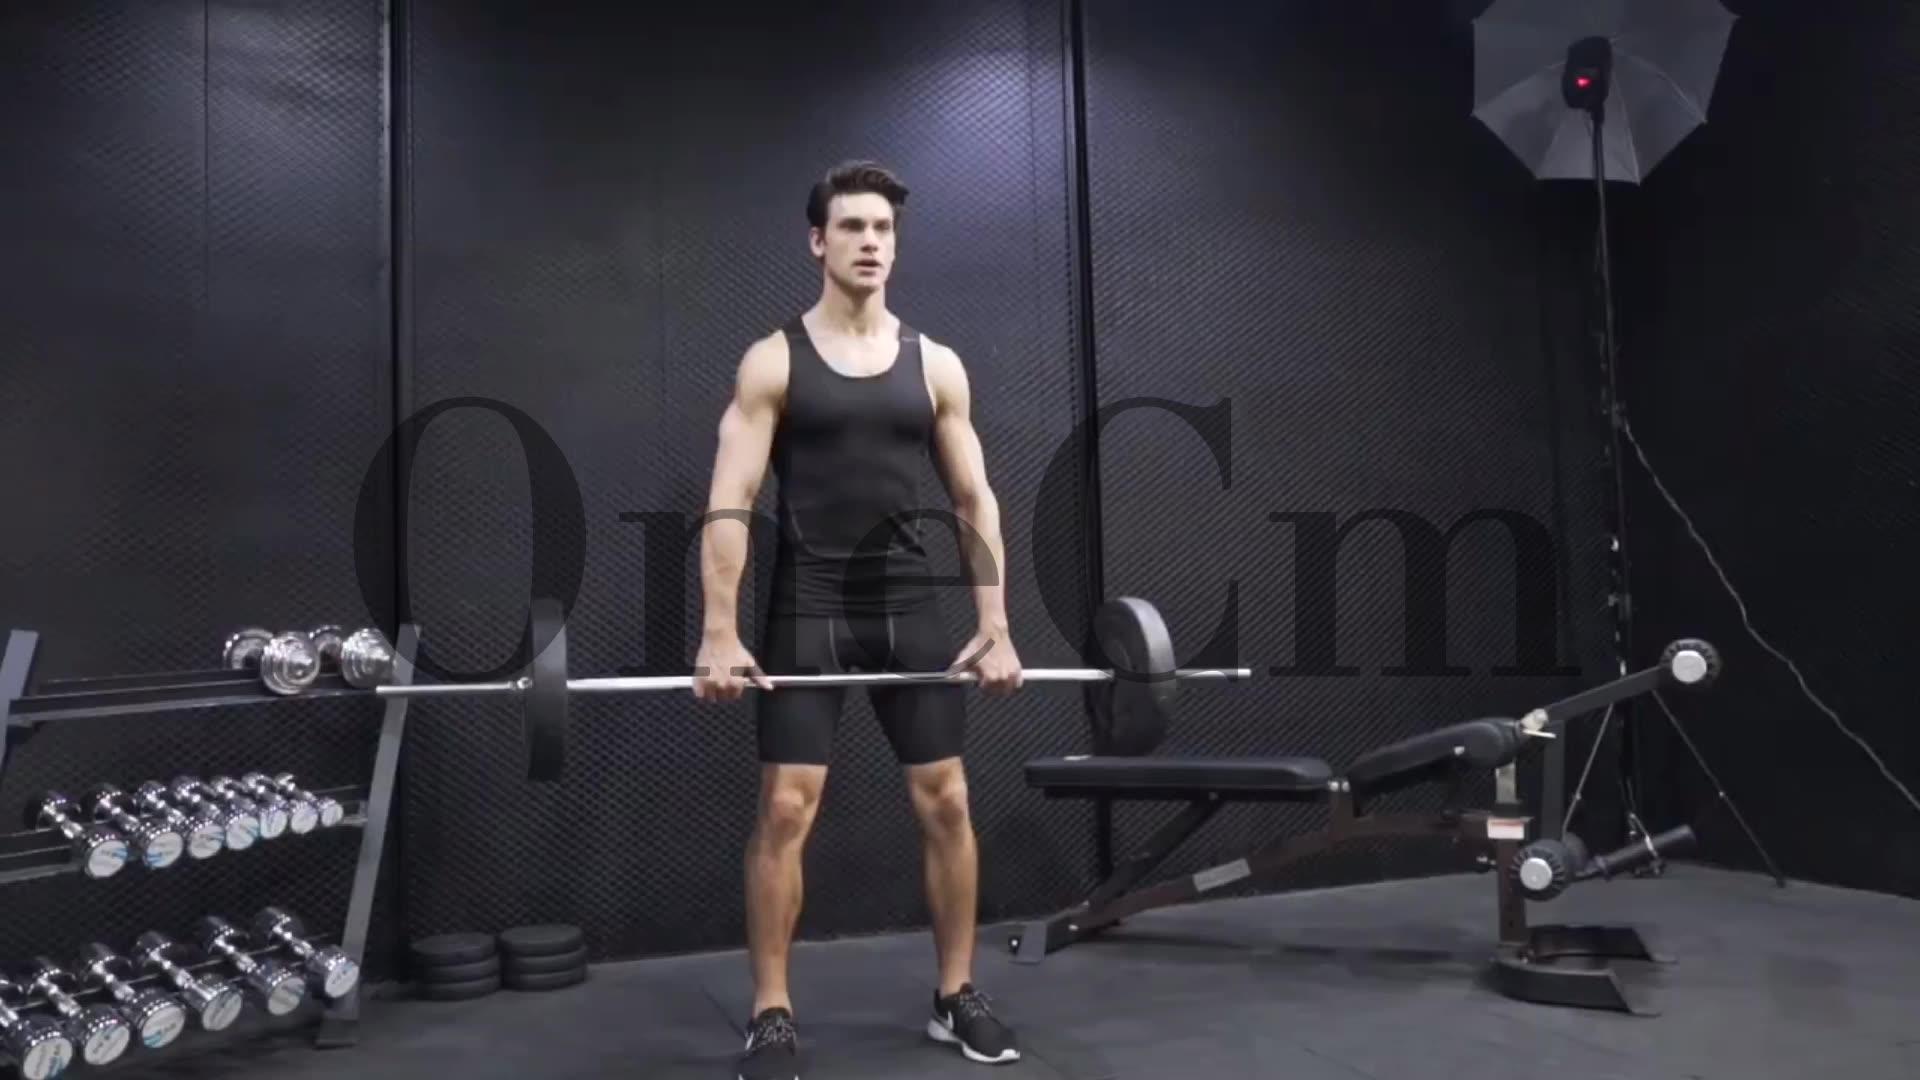 Cheap Oem Print Custom Sleeveless T Shirts Clothes Men Apparel Sport Fitness Quantity Summer